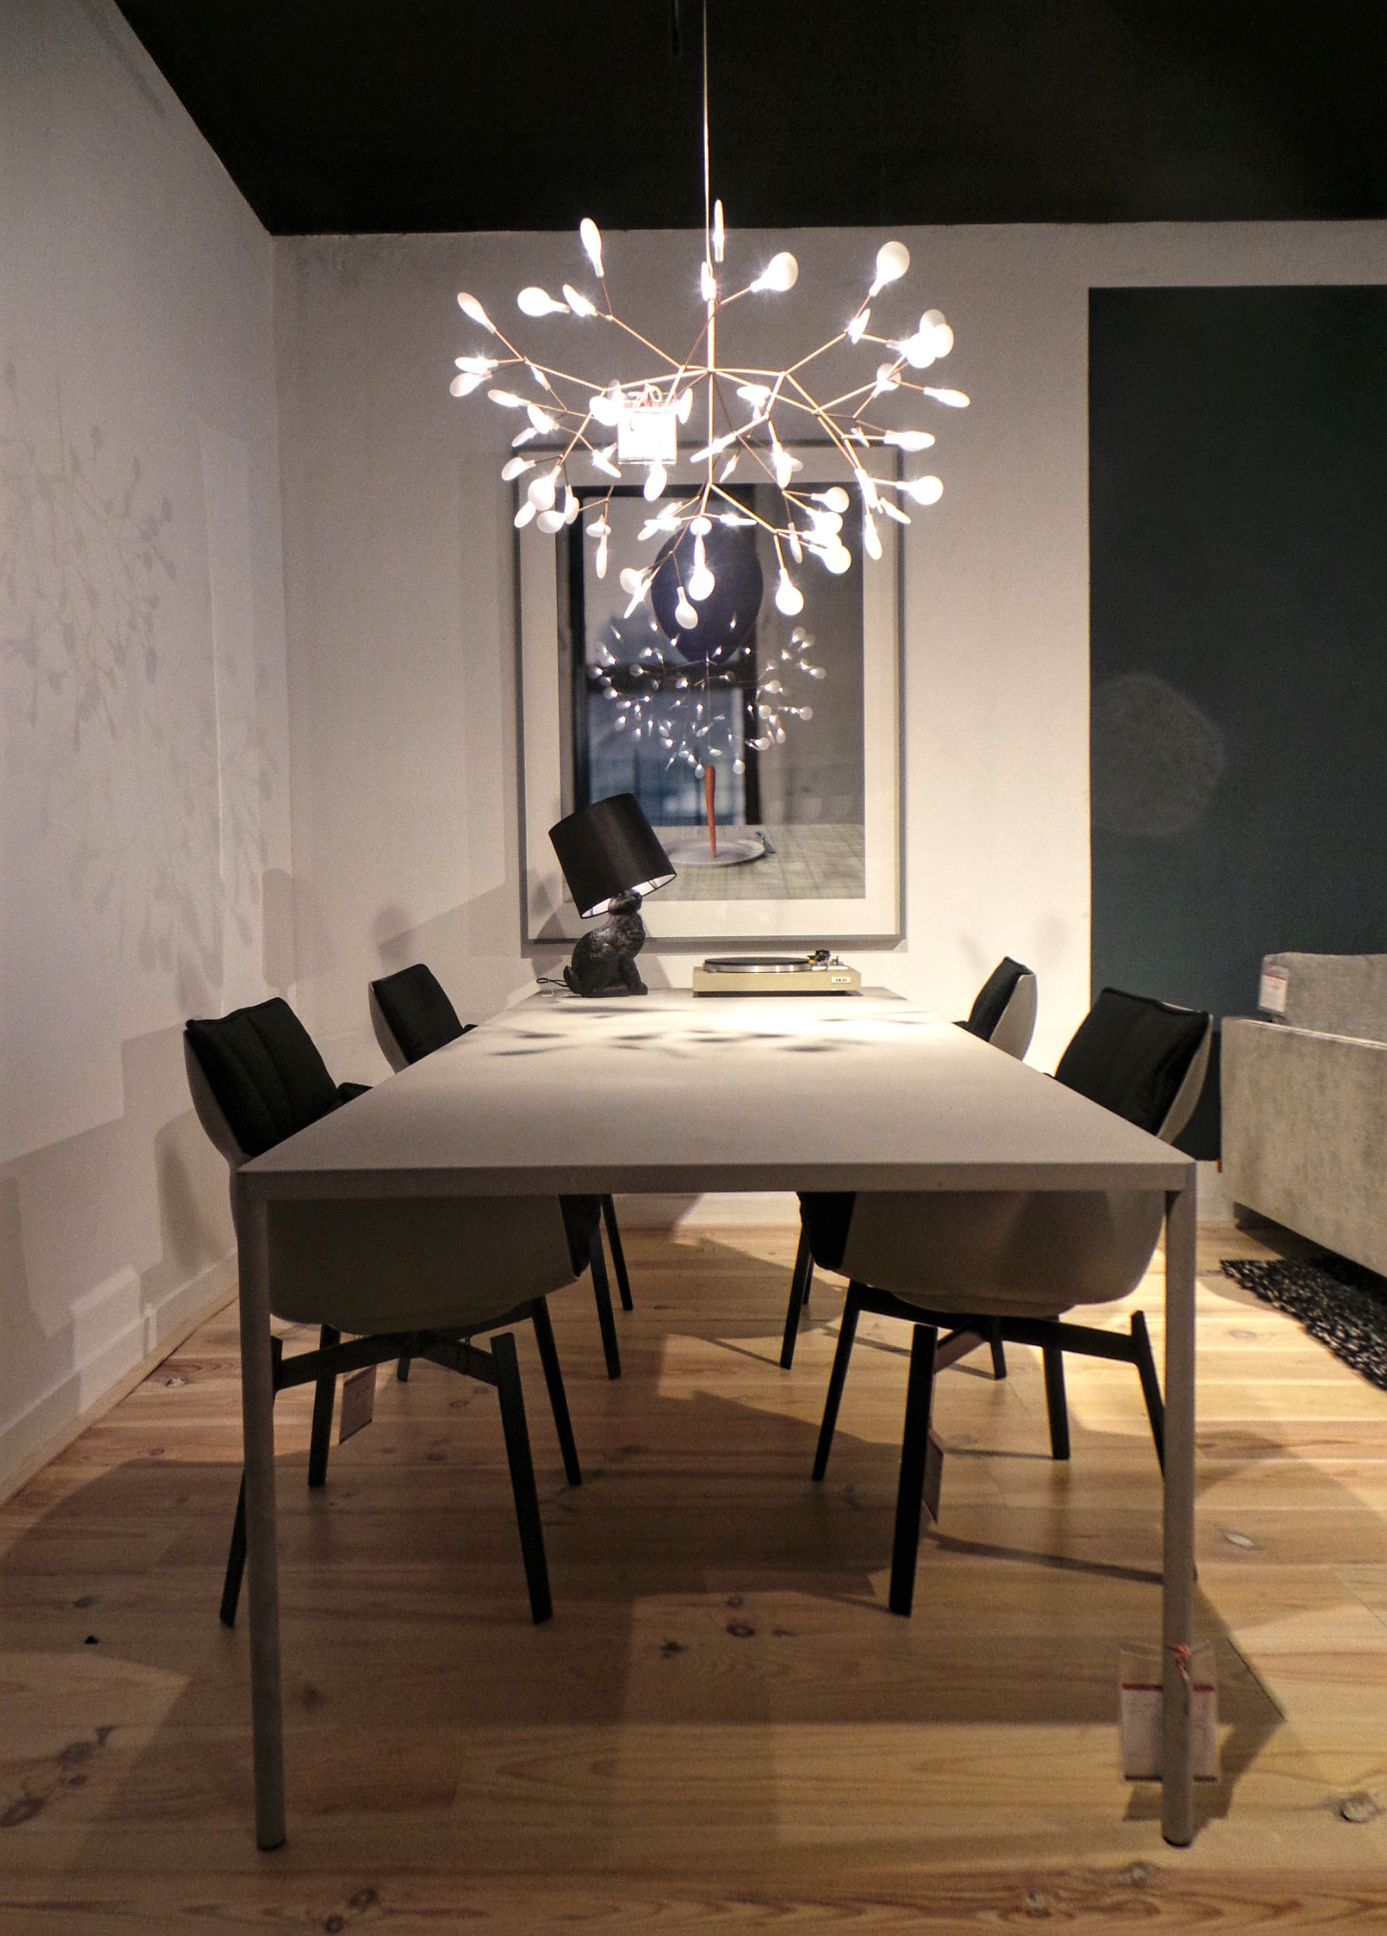 B B Italia Chair Mdf Table Moooi Table Lamp Lampen Eethoek